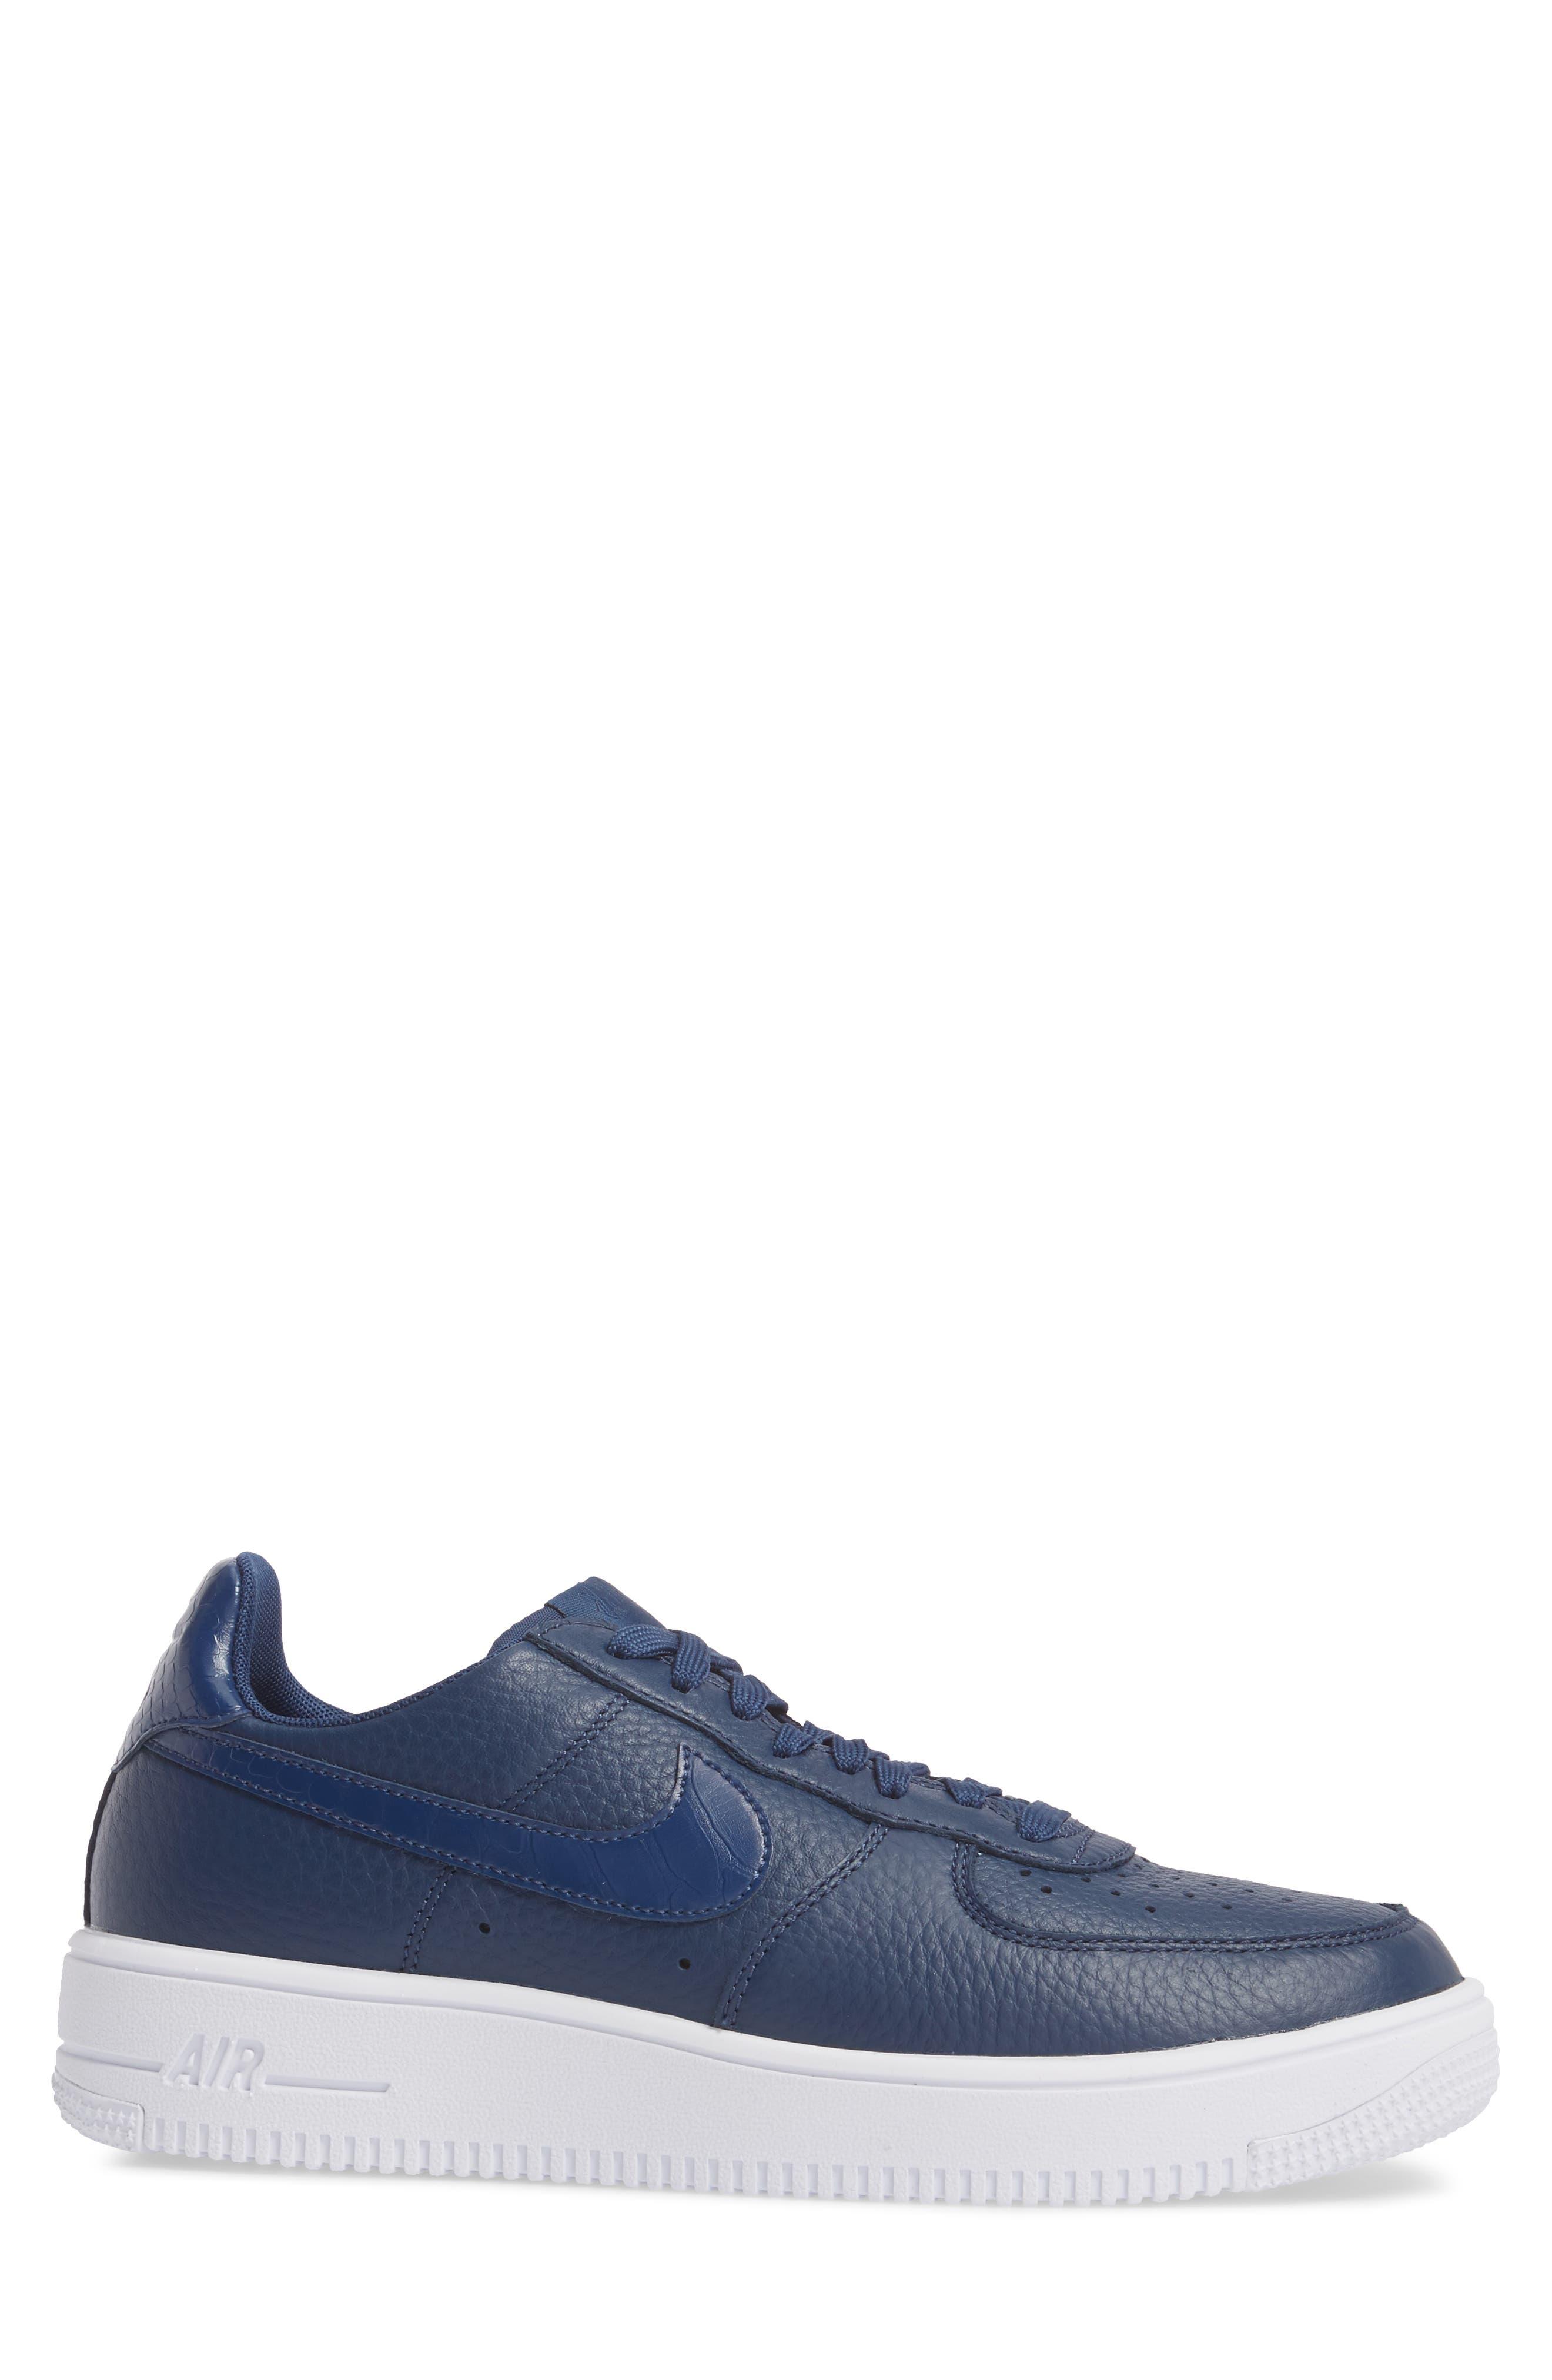 Air Force 1 Ultraforce Sneaker,                             Alternate thumbnail 3, color,                             Navy/ Navy/ White